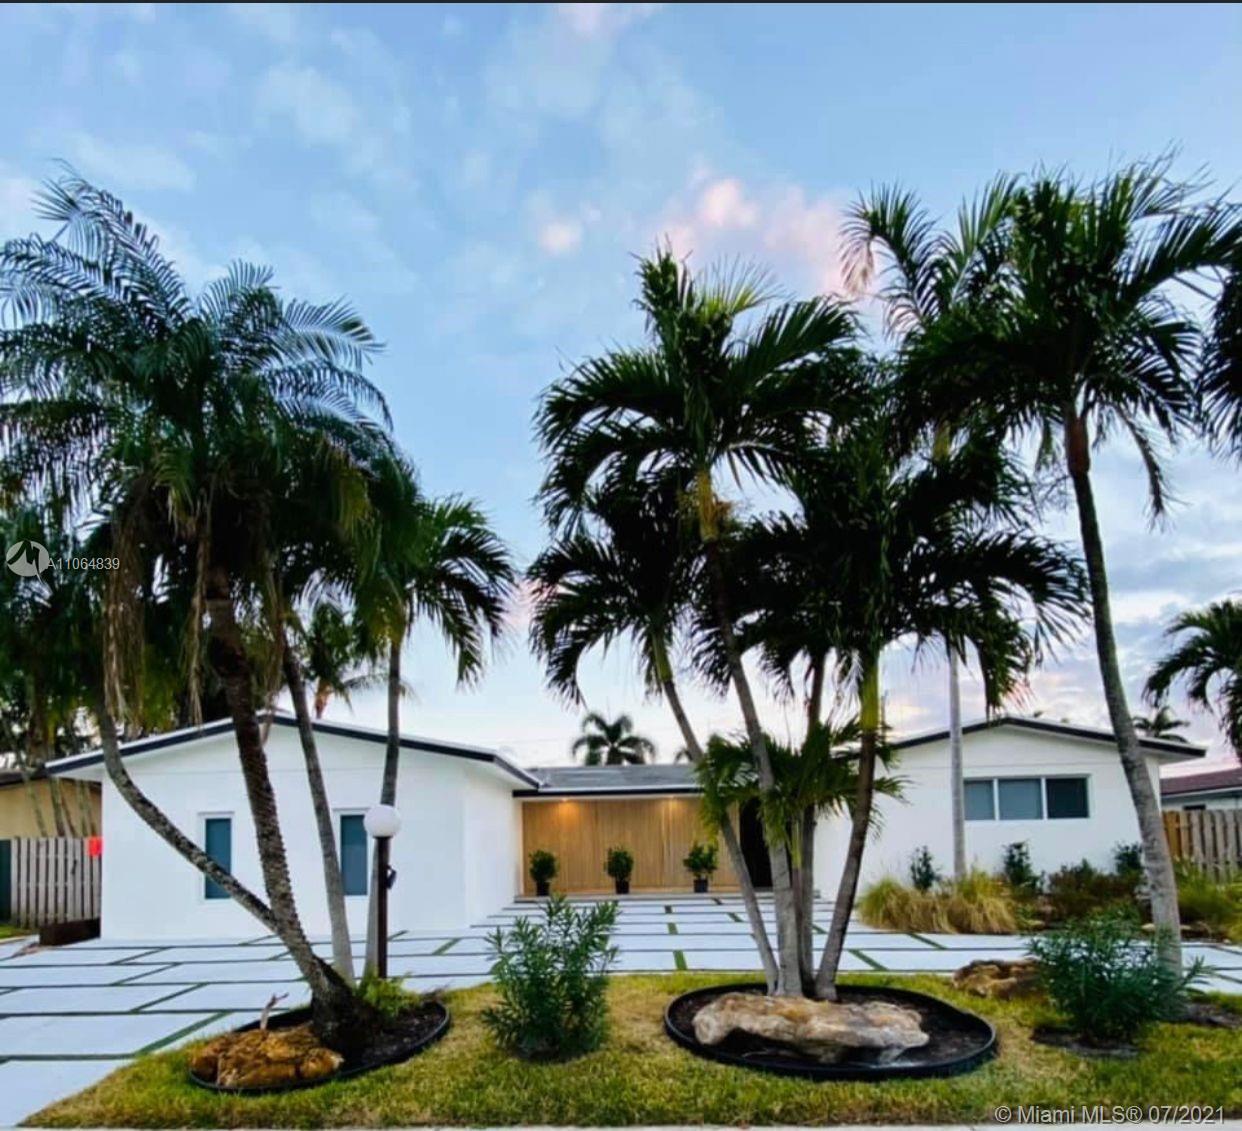 Highland Lakes - 2050 NE 203rd St, Miami, FL 33179